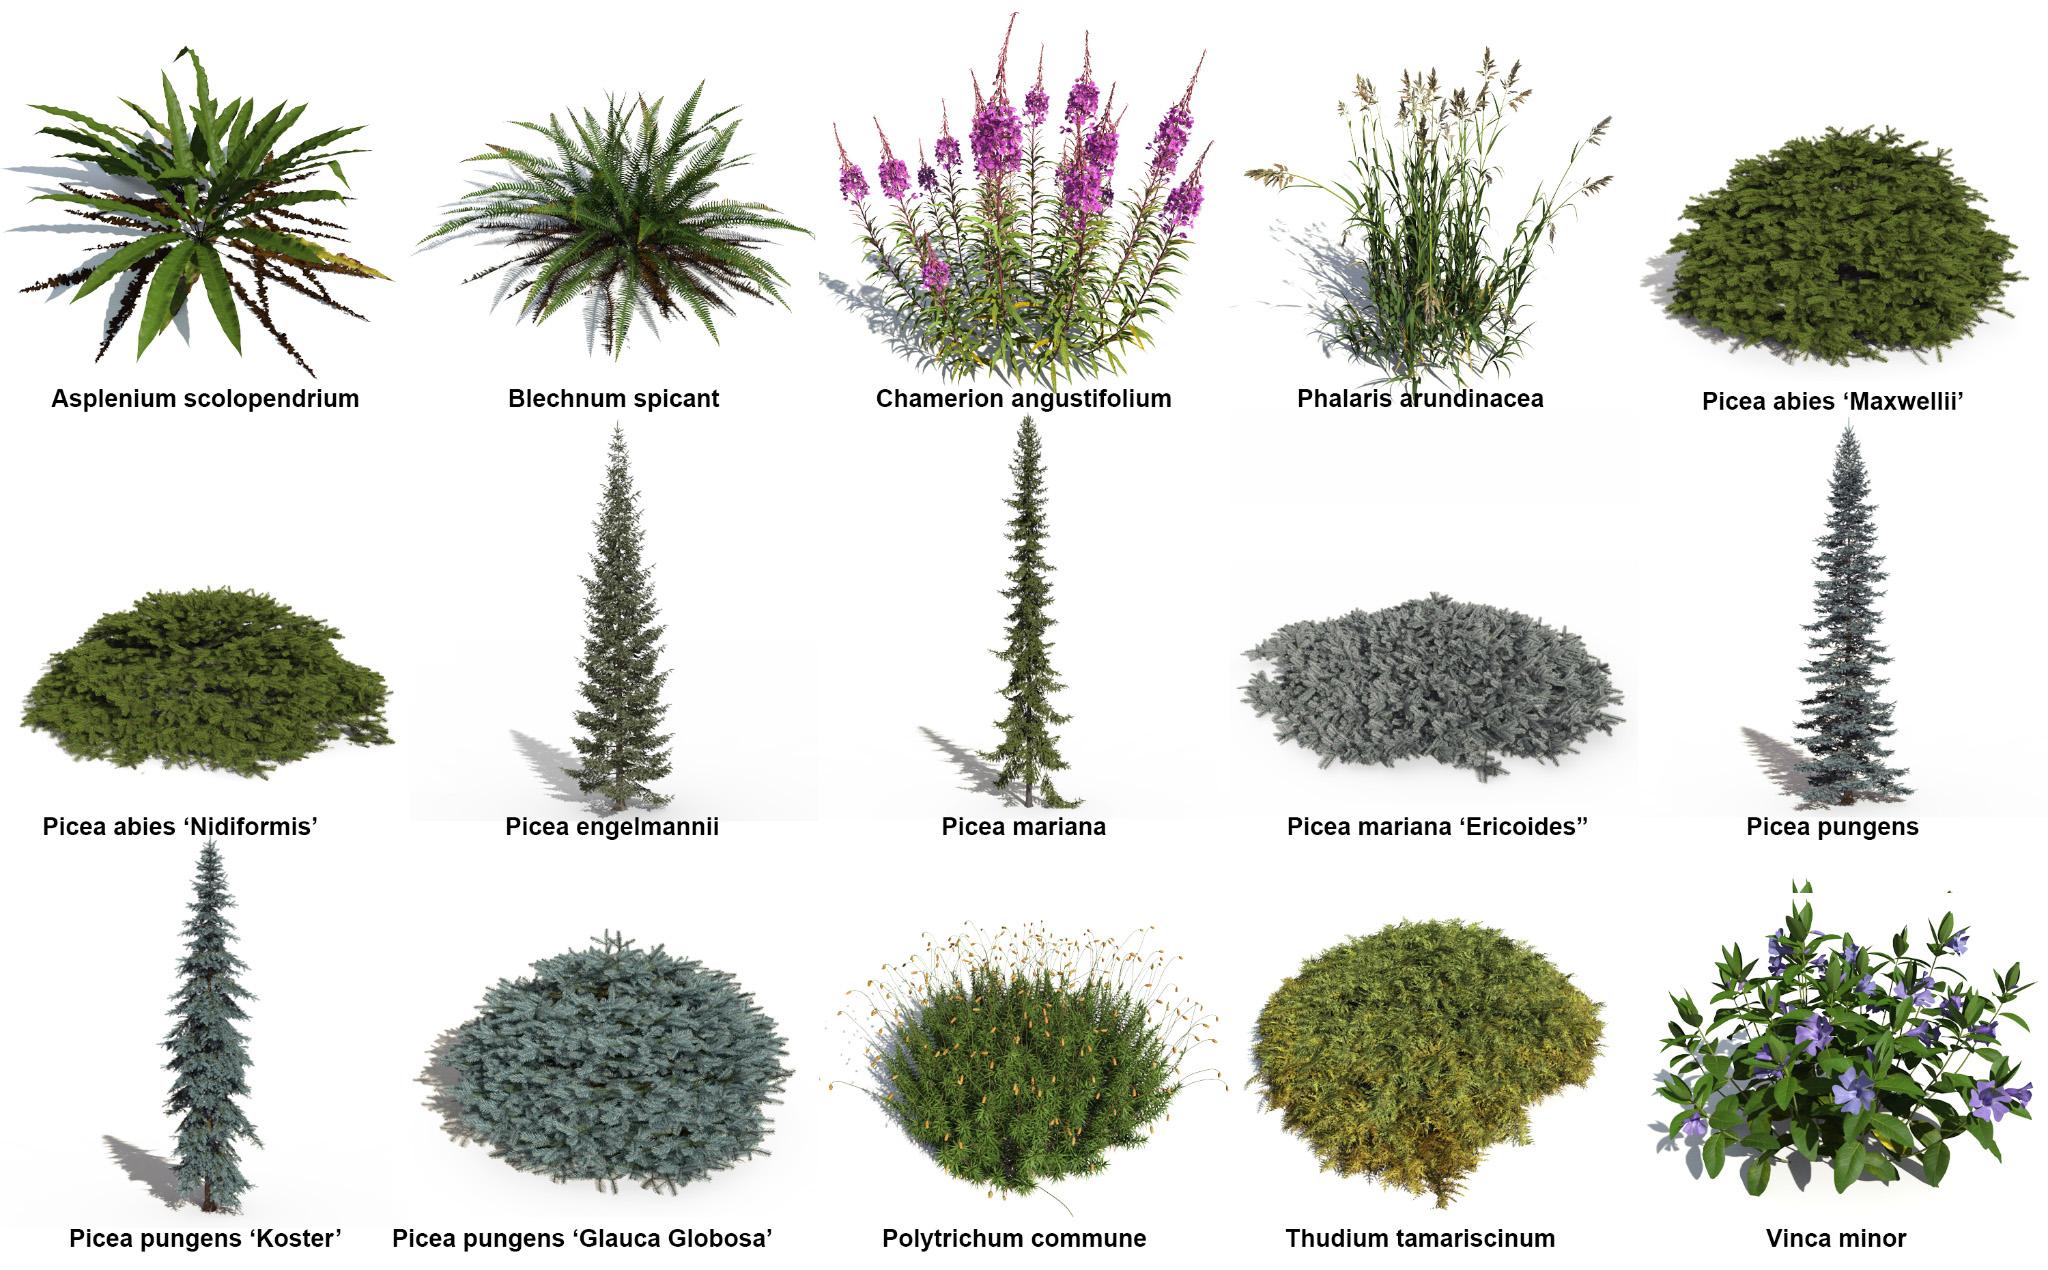 The new PlantCatalog plants of R5